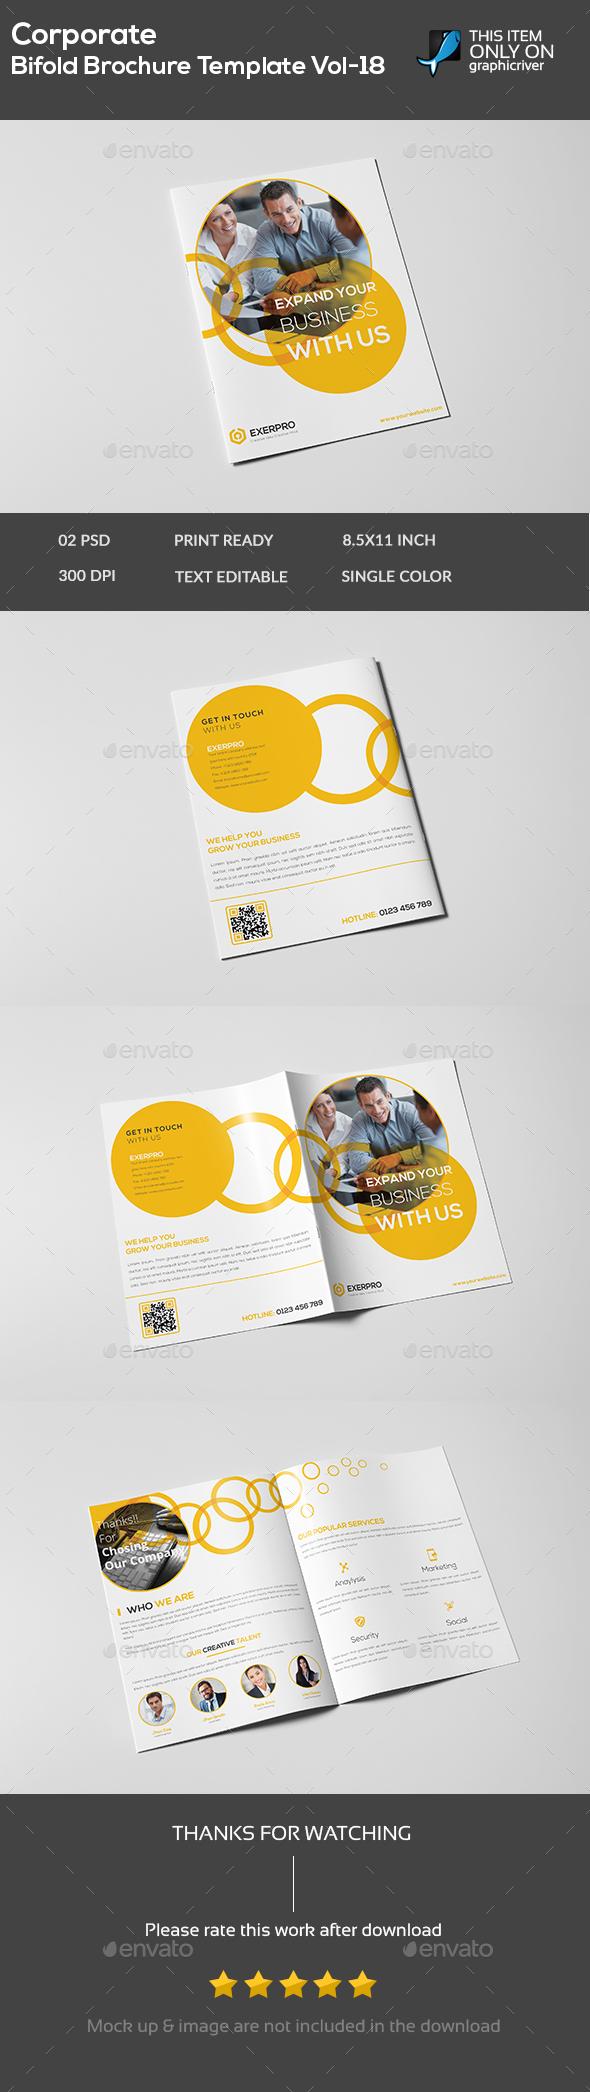 Corporate Bifold Brochure Template Vol-18 - Brochures Print Templates